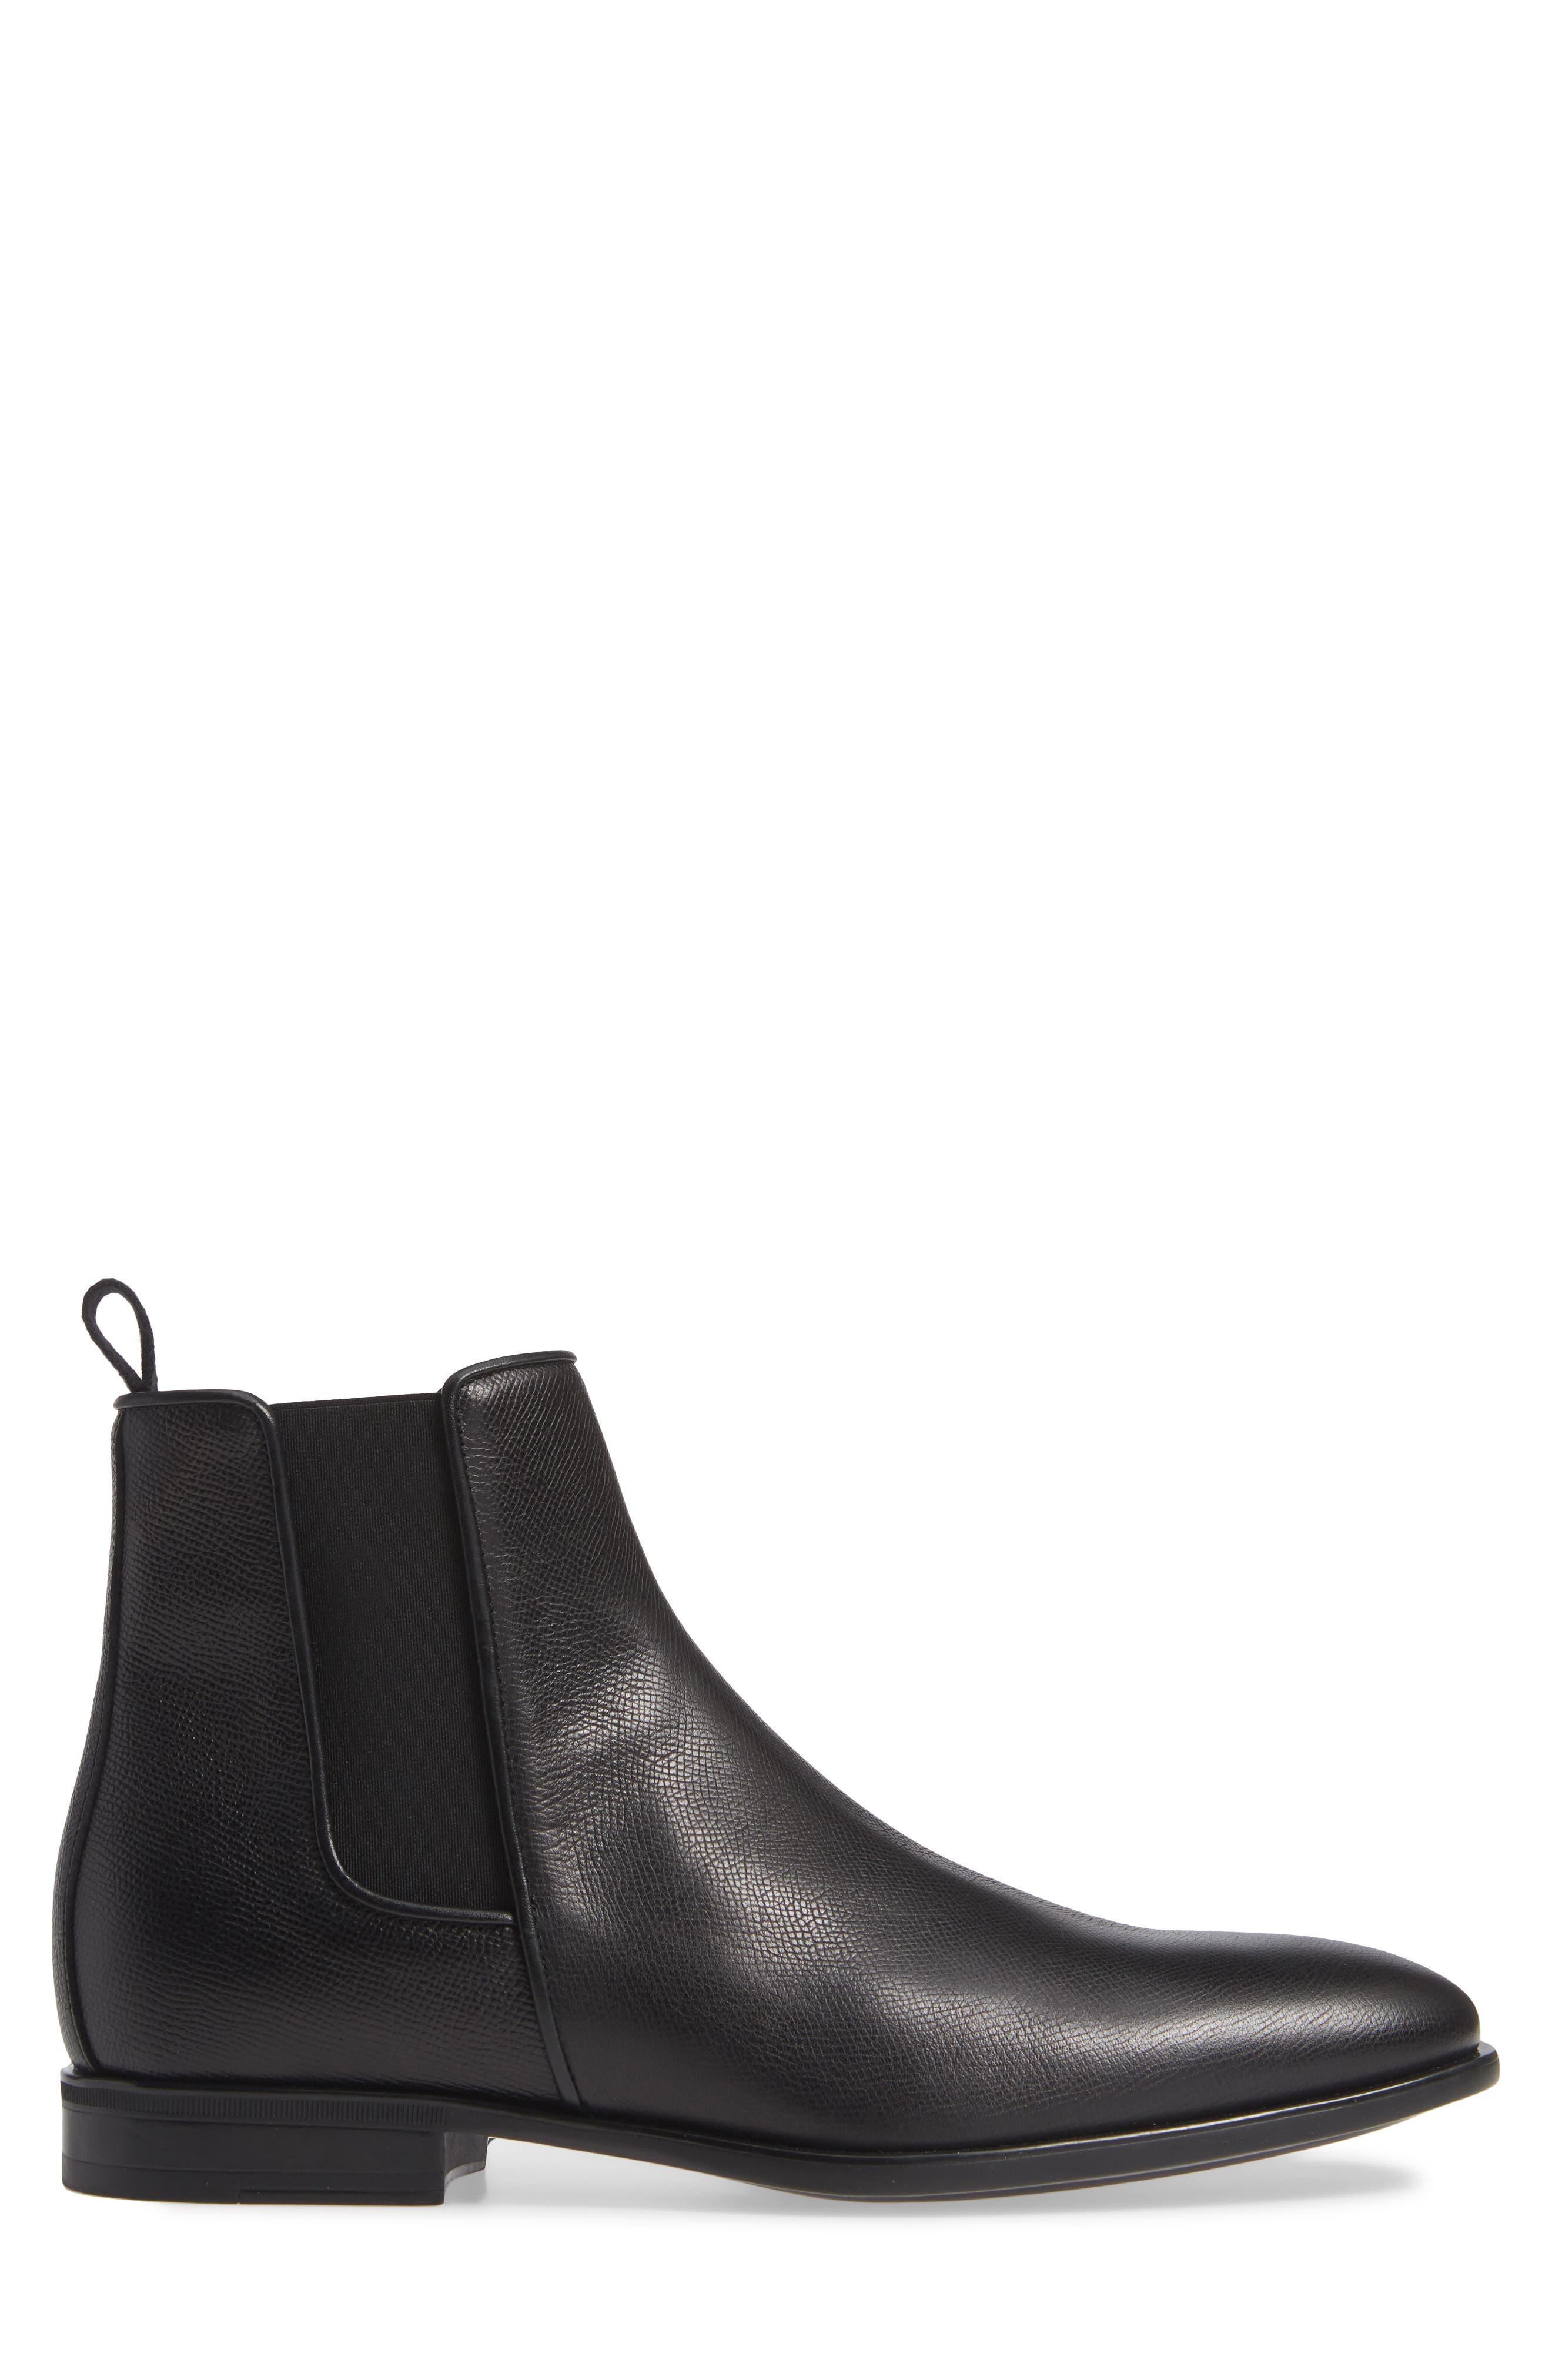 AQUATALIA, 'Adrian' Water Resistant Chelsea Boot, Alternate thumbnail 3, color, BLACK/ BLACK